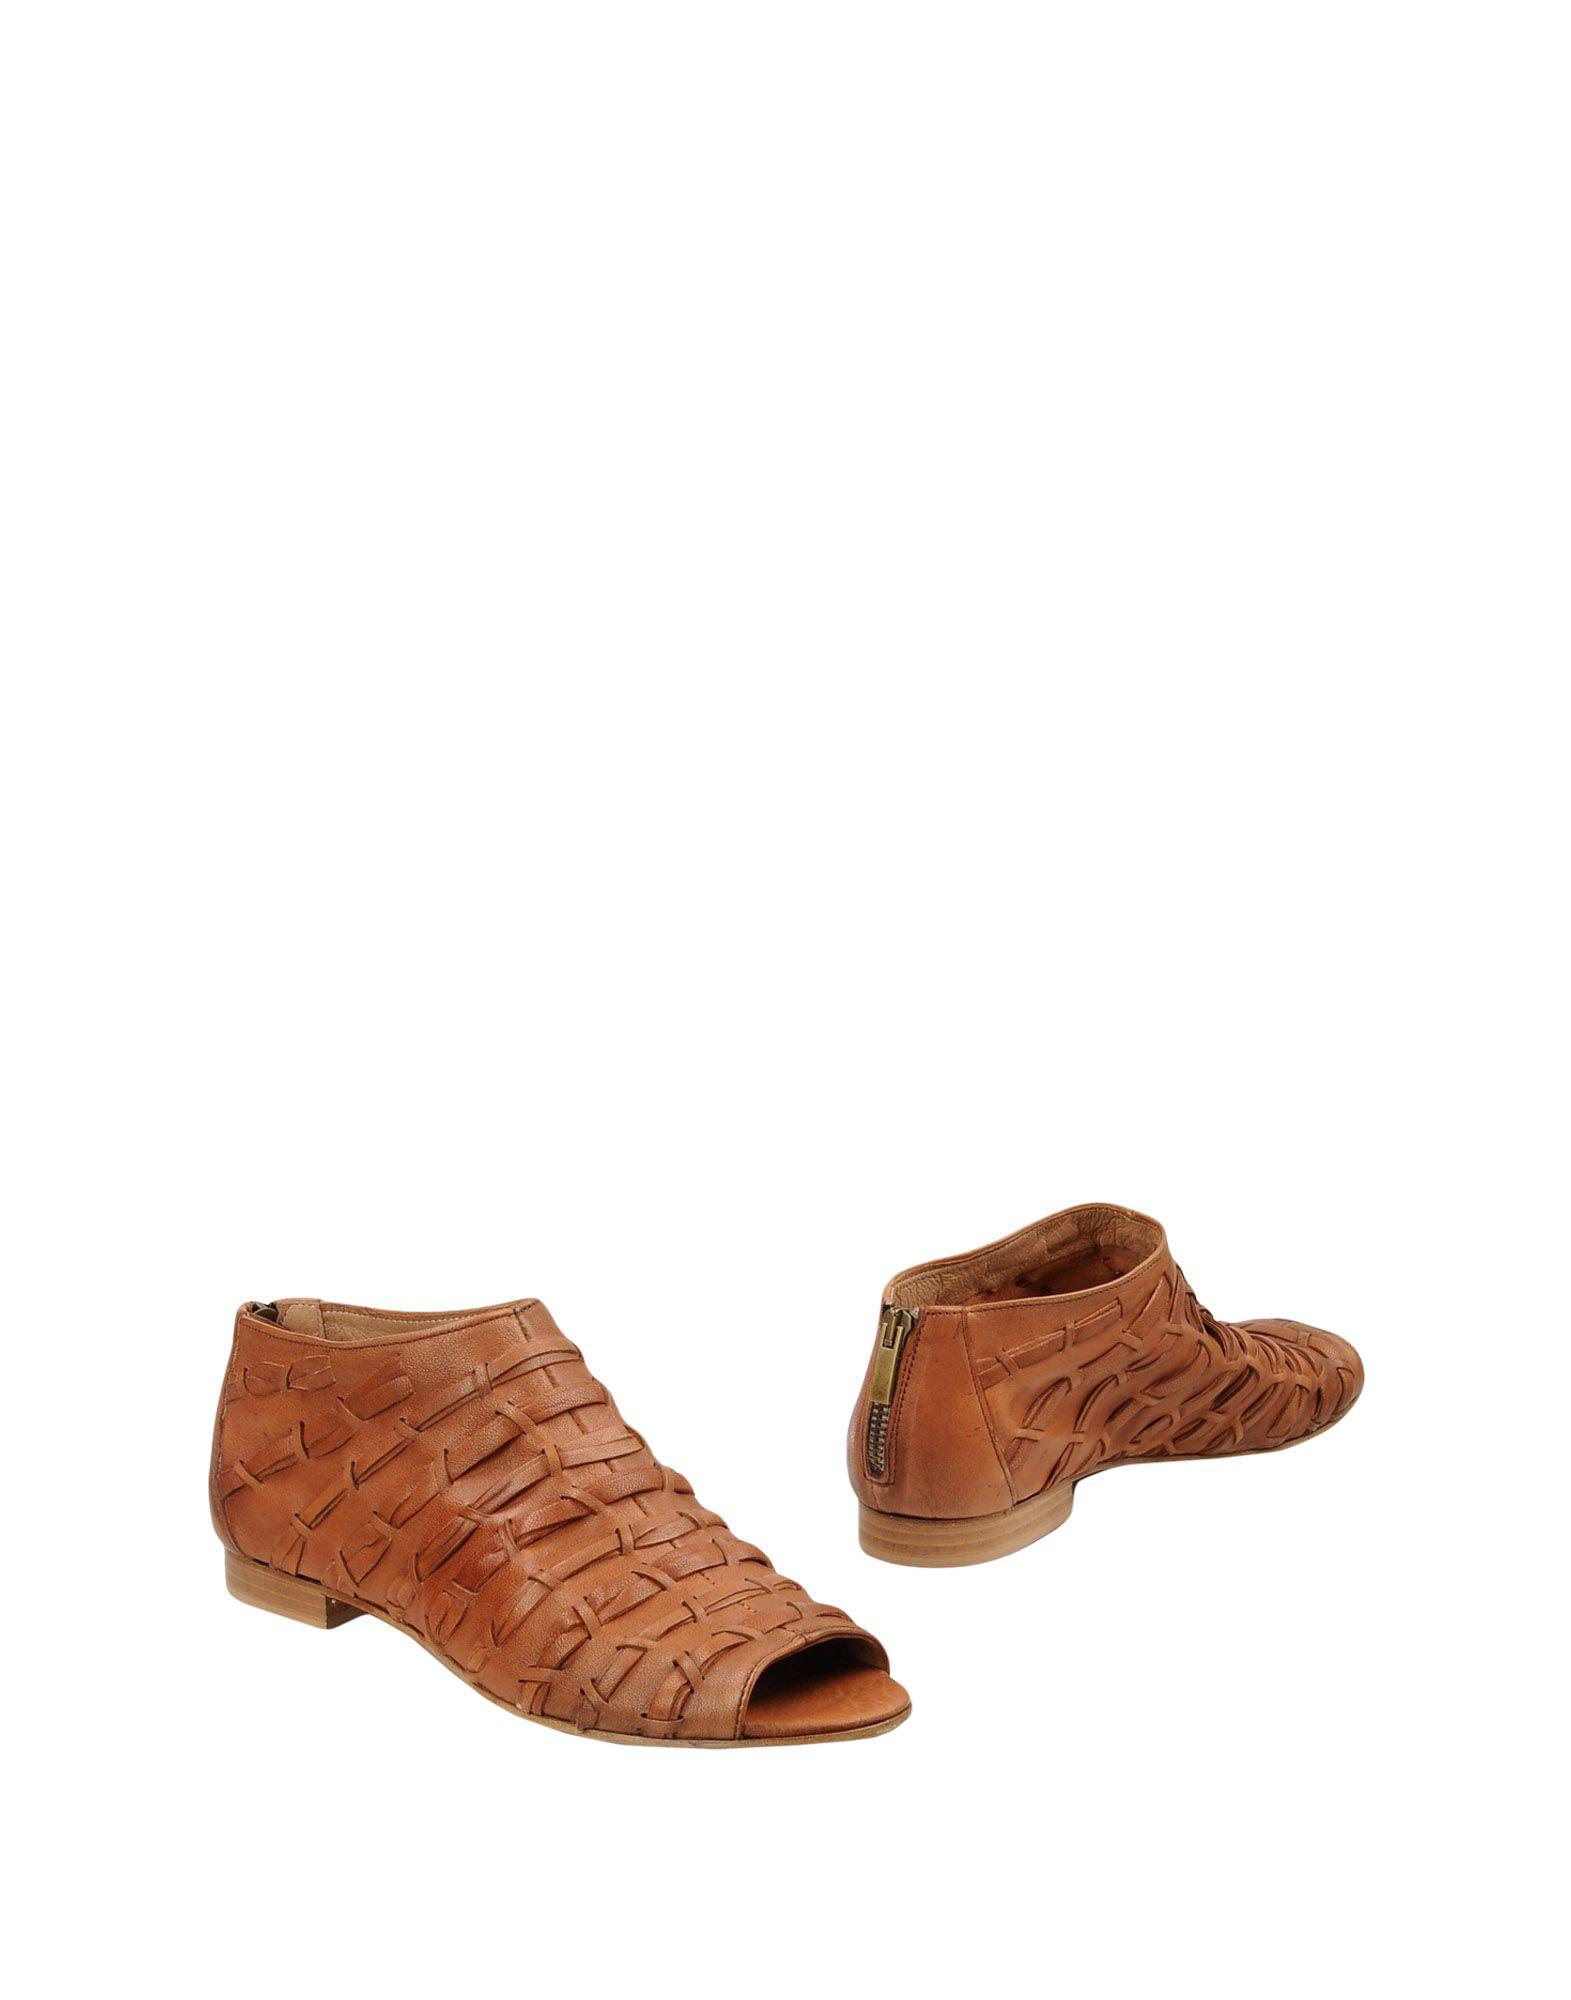 Leonardo Principi Stiefelette Damen  11425222XT Gute Qualität beliebte Schuhe